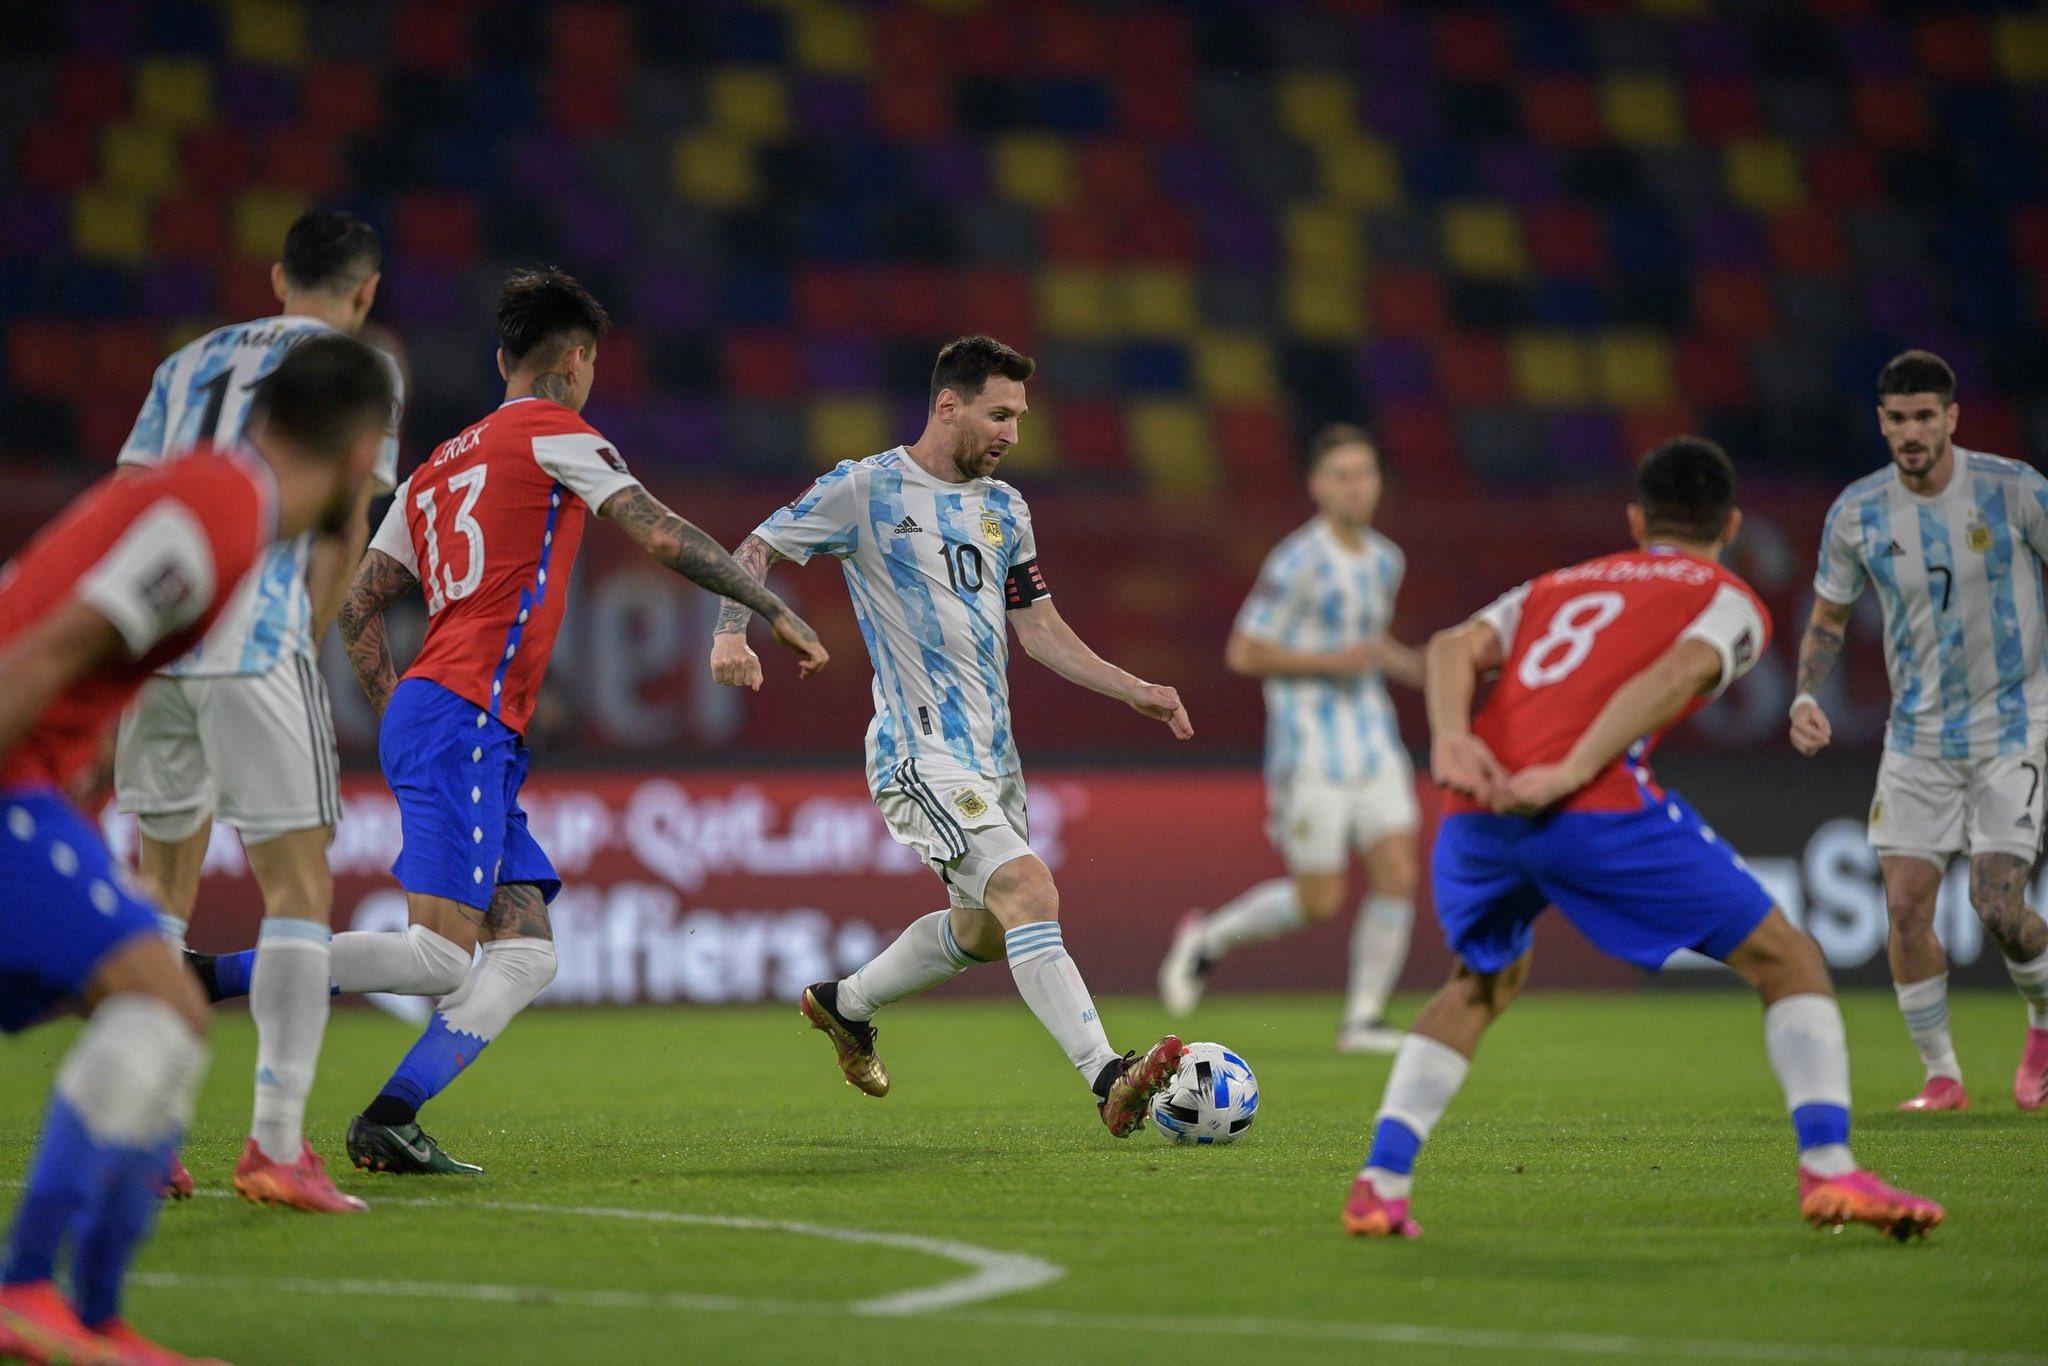 Messi sekali lagi diharapkan membantu Argentina mencapai puncak kejayaan, setelah banyak janji yang gagal di Copa America.  Foto: AFA